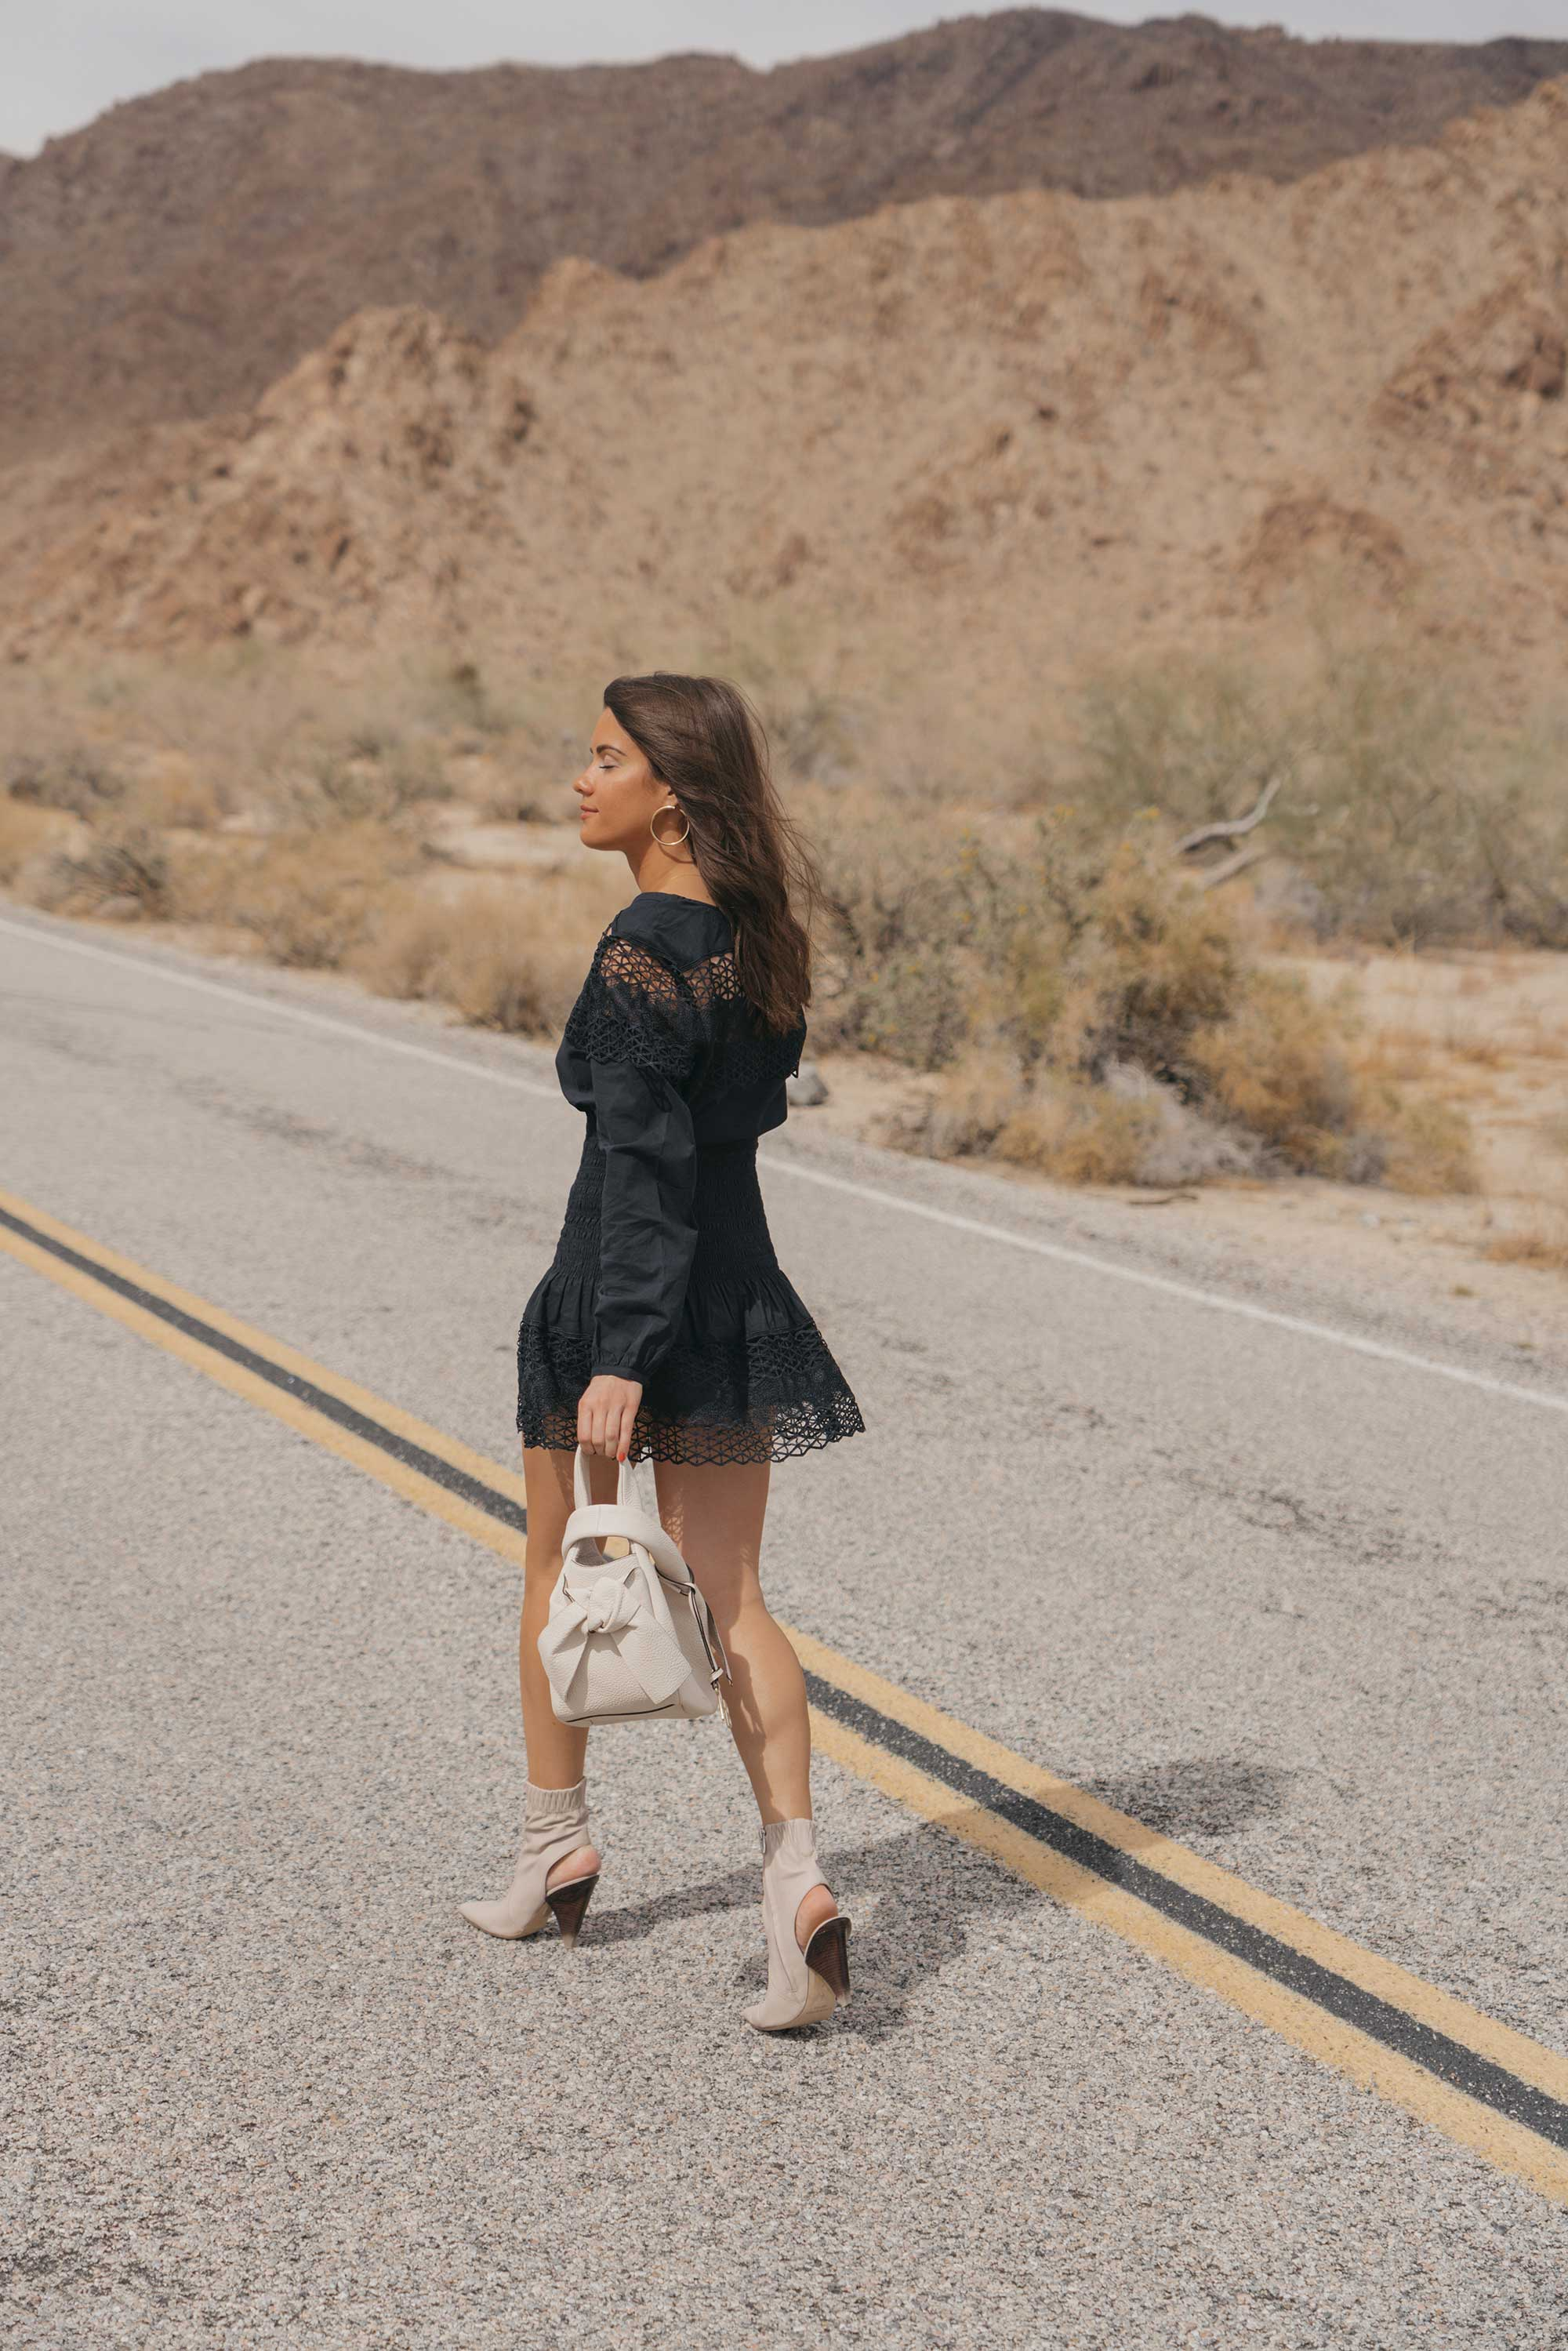 black lace festival outfit for Coachella Desert9.jpg